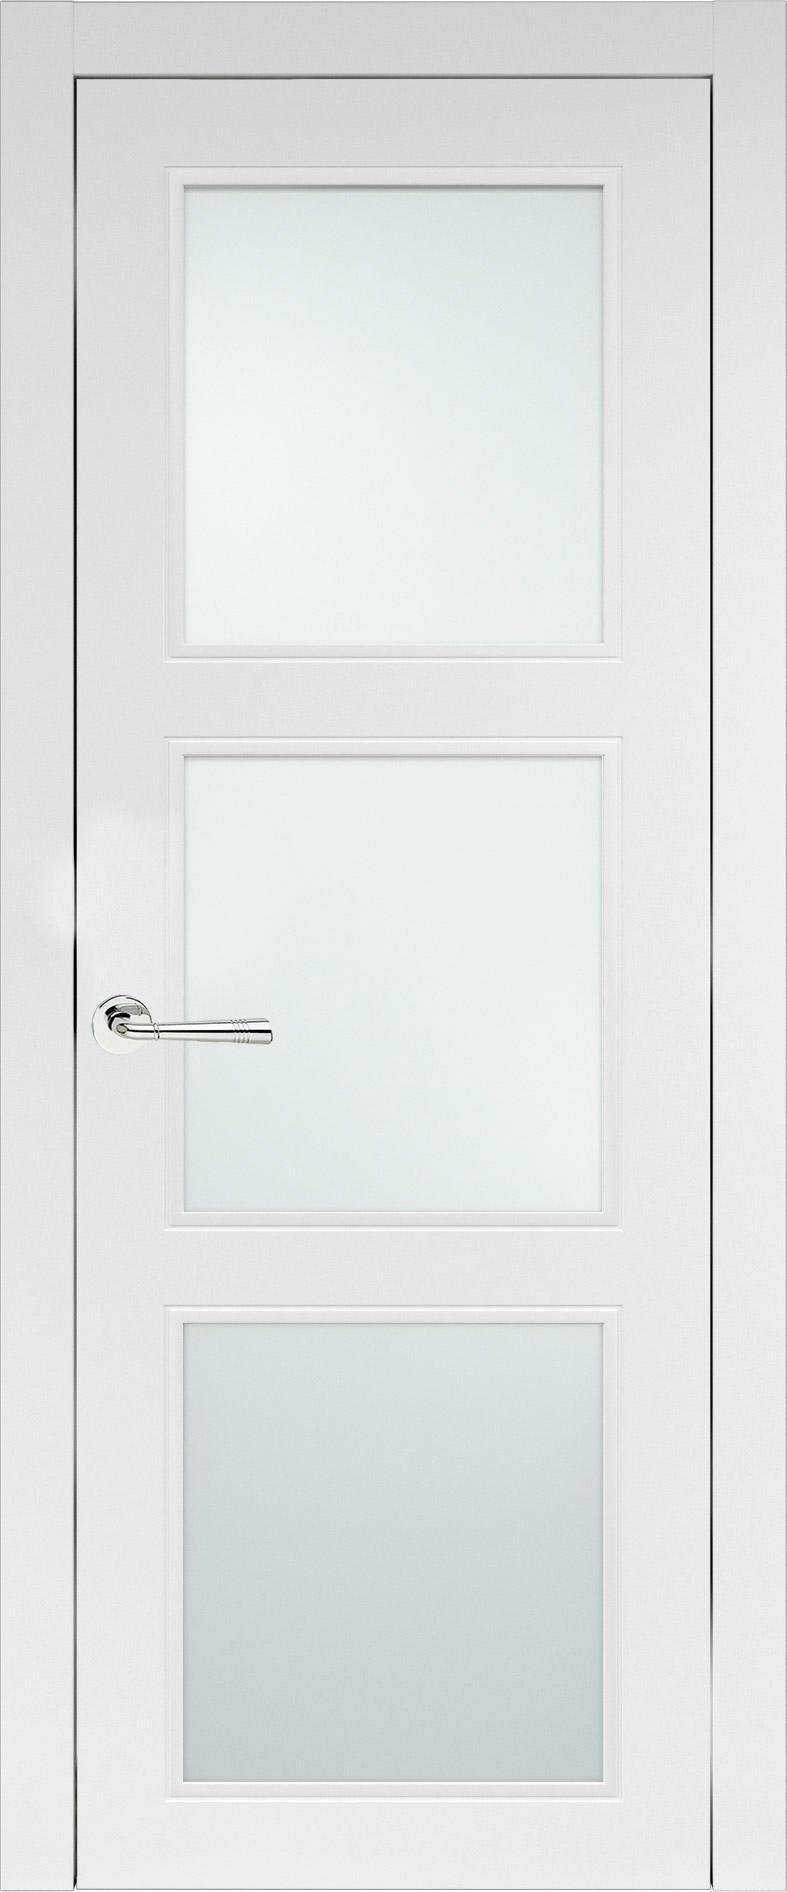 Milano Neo Classic цвет - Белая эмаль (RAL 9003) Со стеклом (ДО)